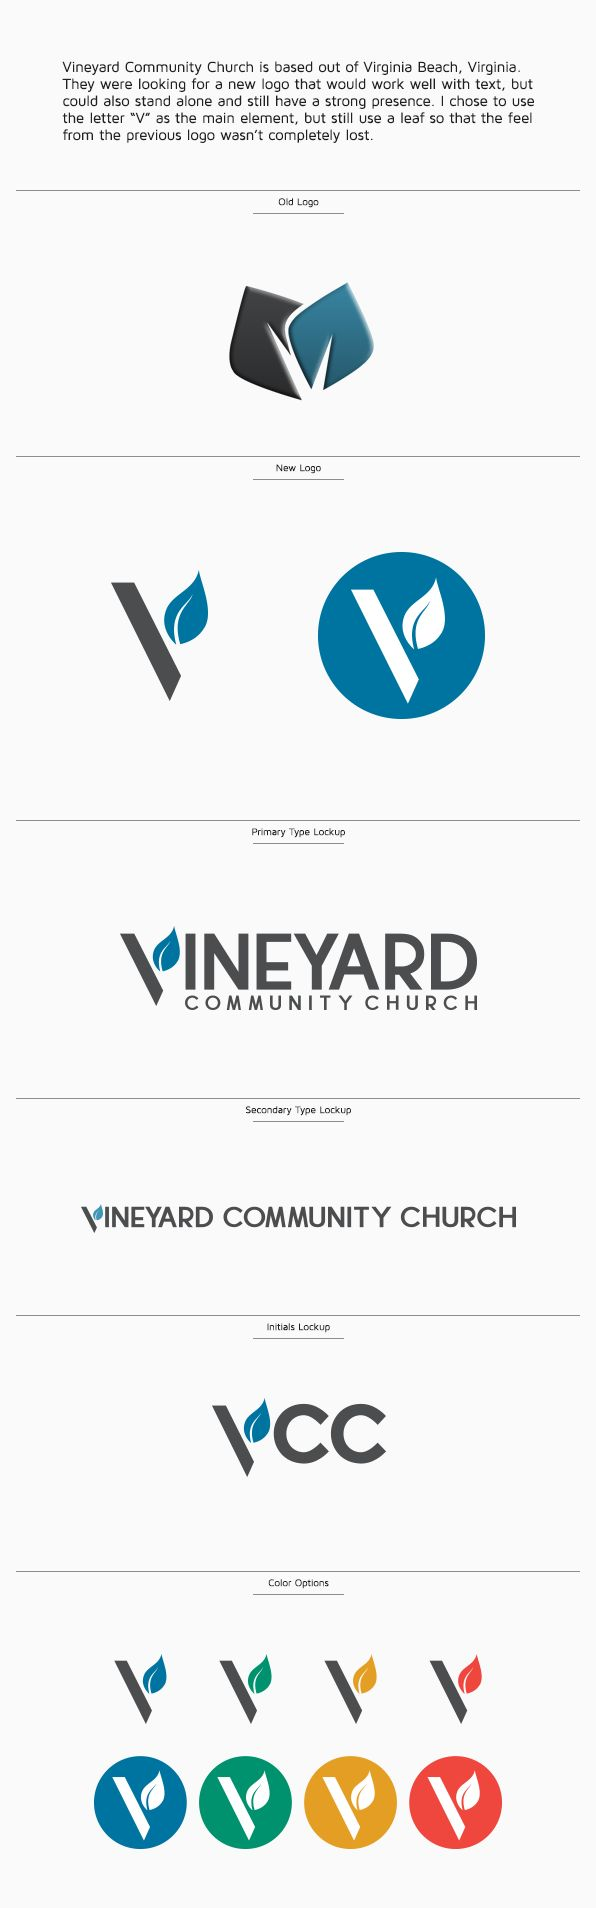 Vineyard Community Church Identity on Behance